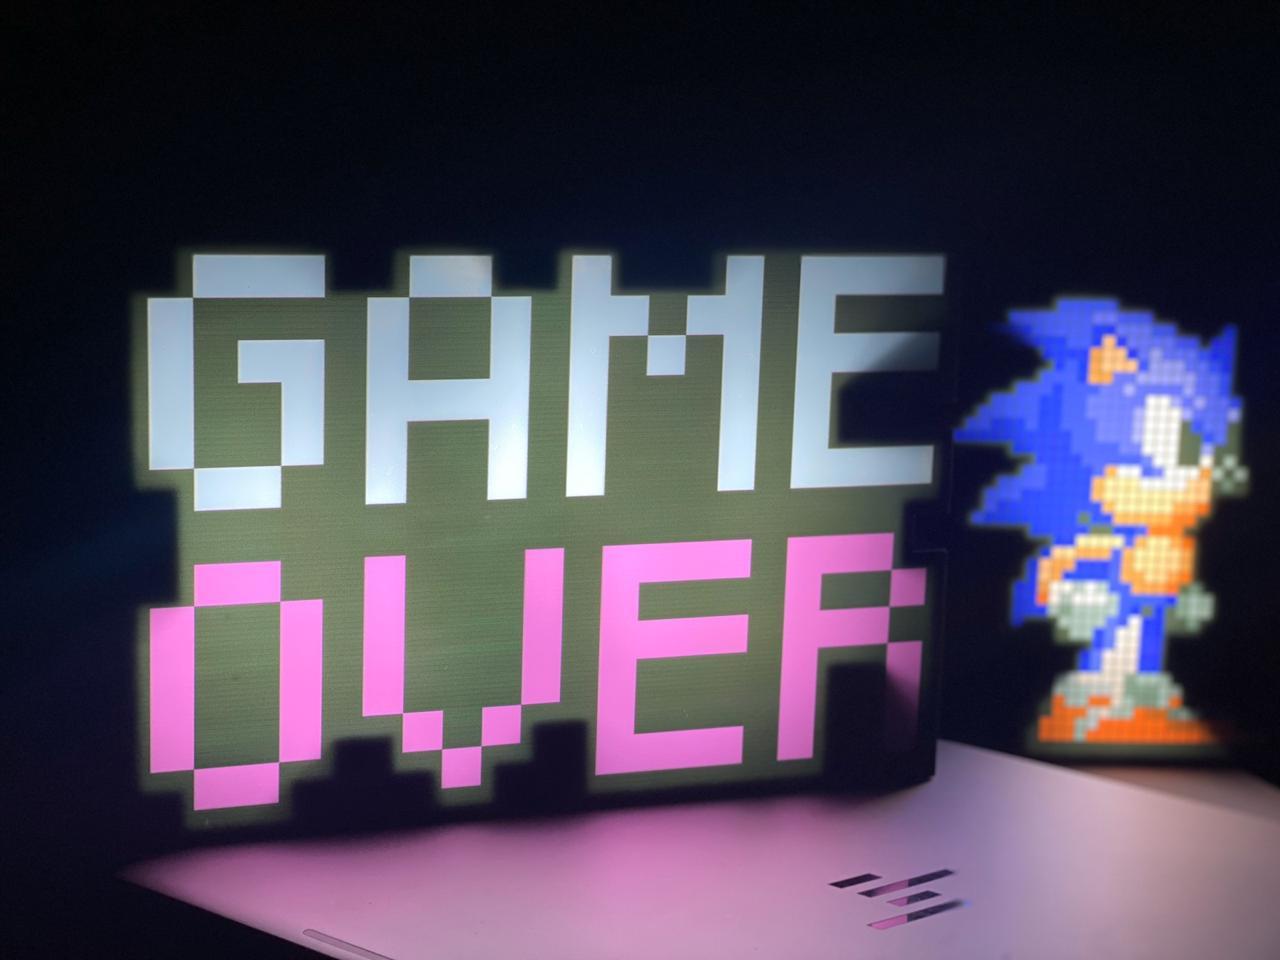 Luminária Pixel Arte Sonic